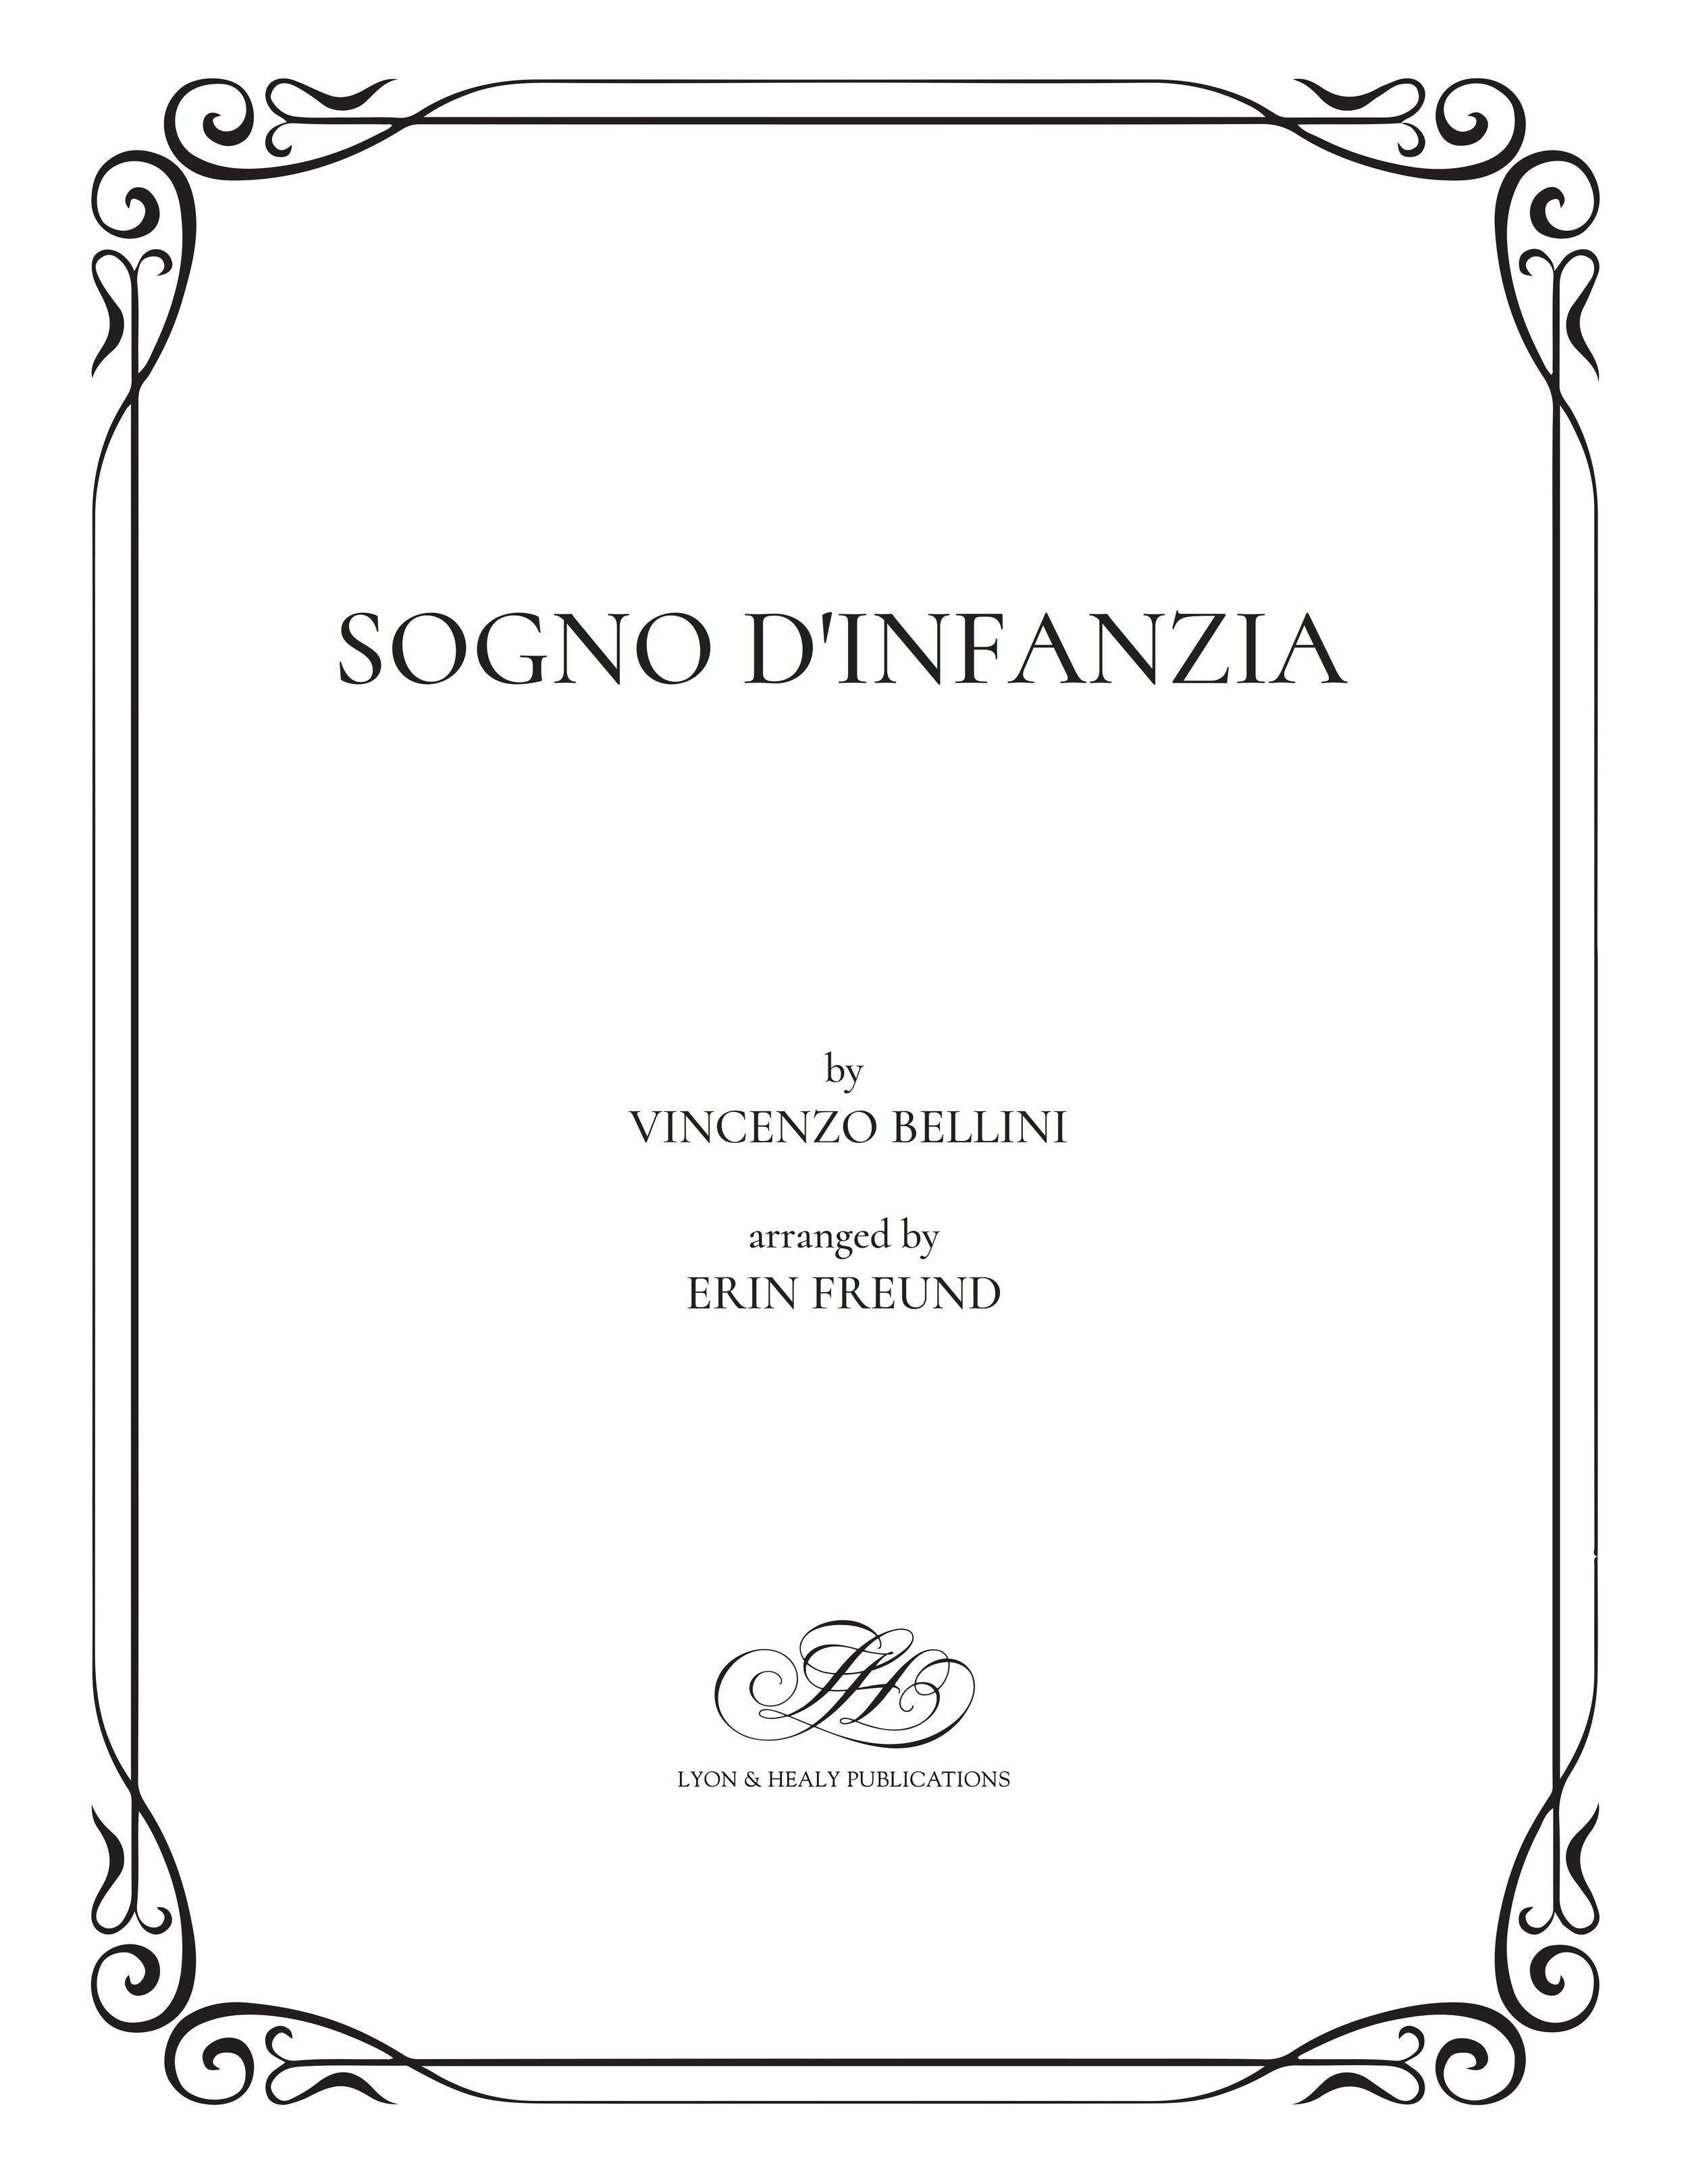 http://www.erinfreund.com/sogno-dinfanzia